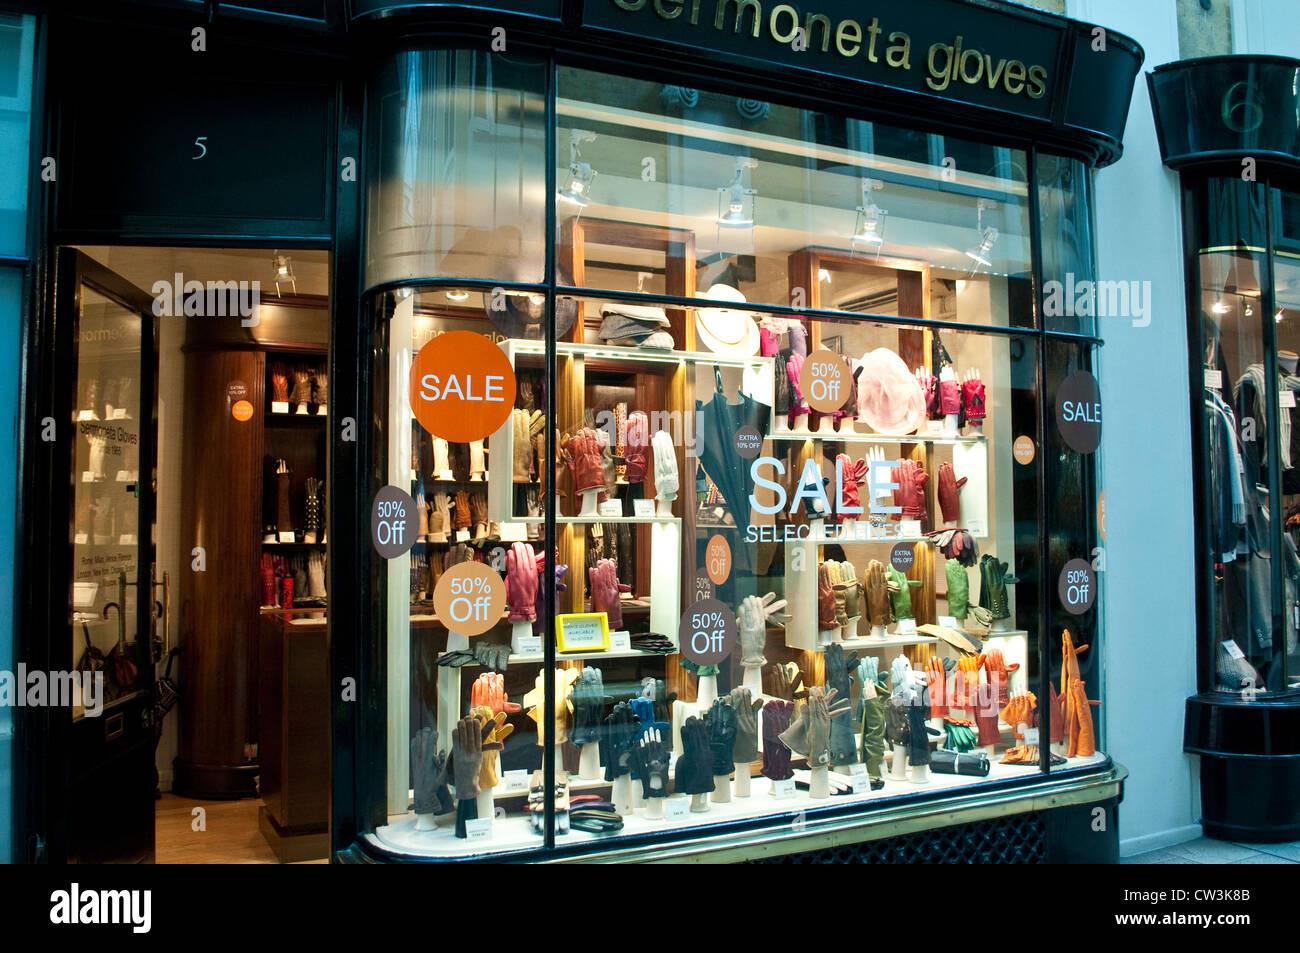 Sermoneta gloves shop, Burlington Arcade, London, UK - Stock Image